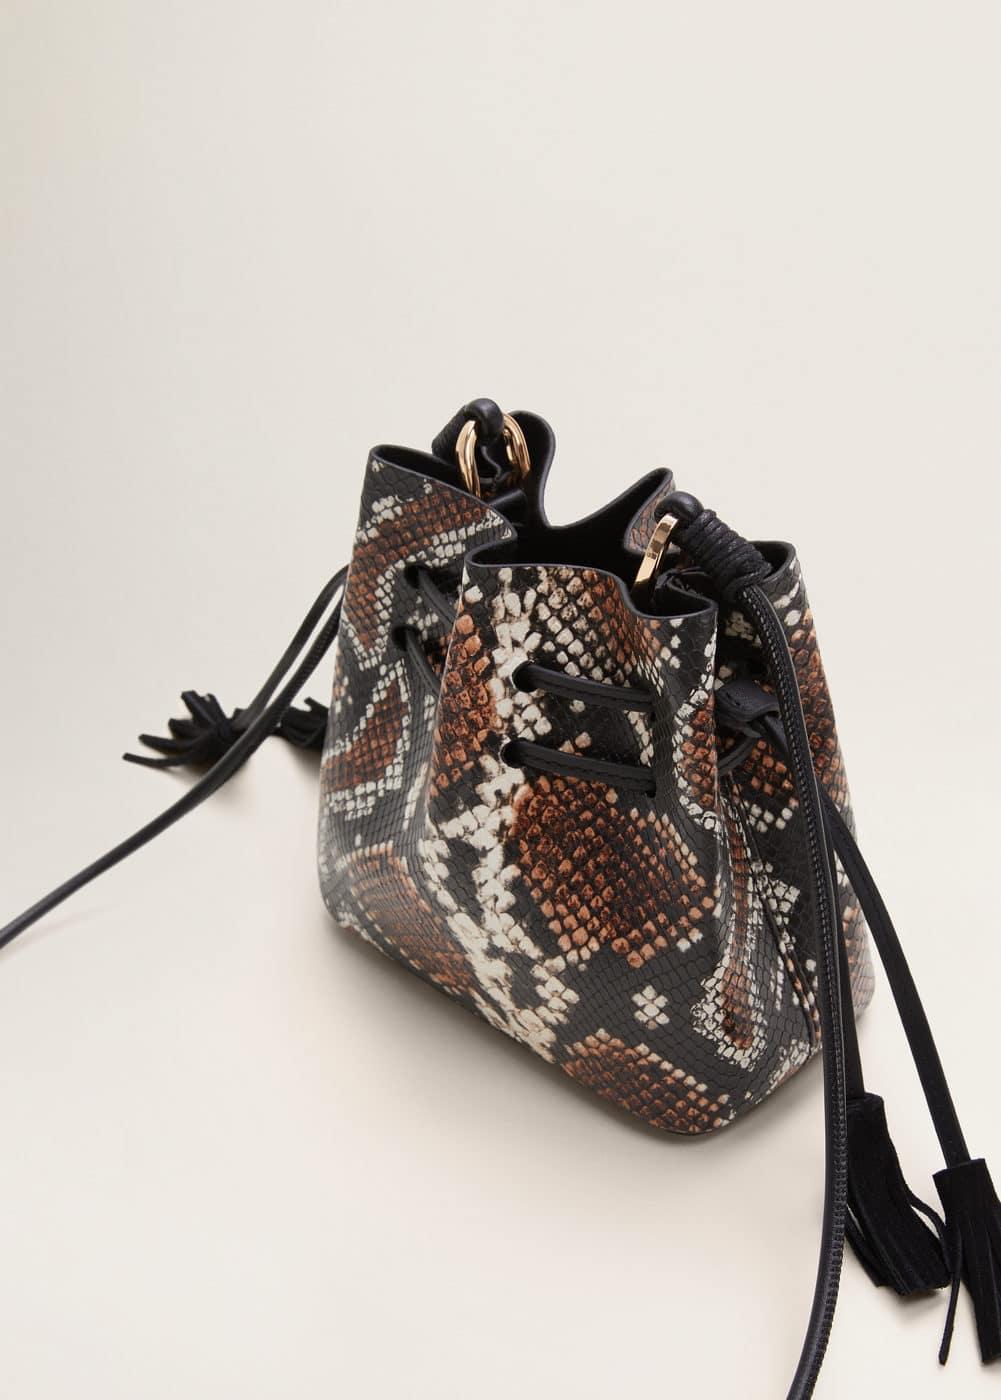 m-upsala:bolso saco serpiente